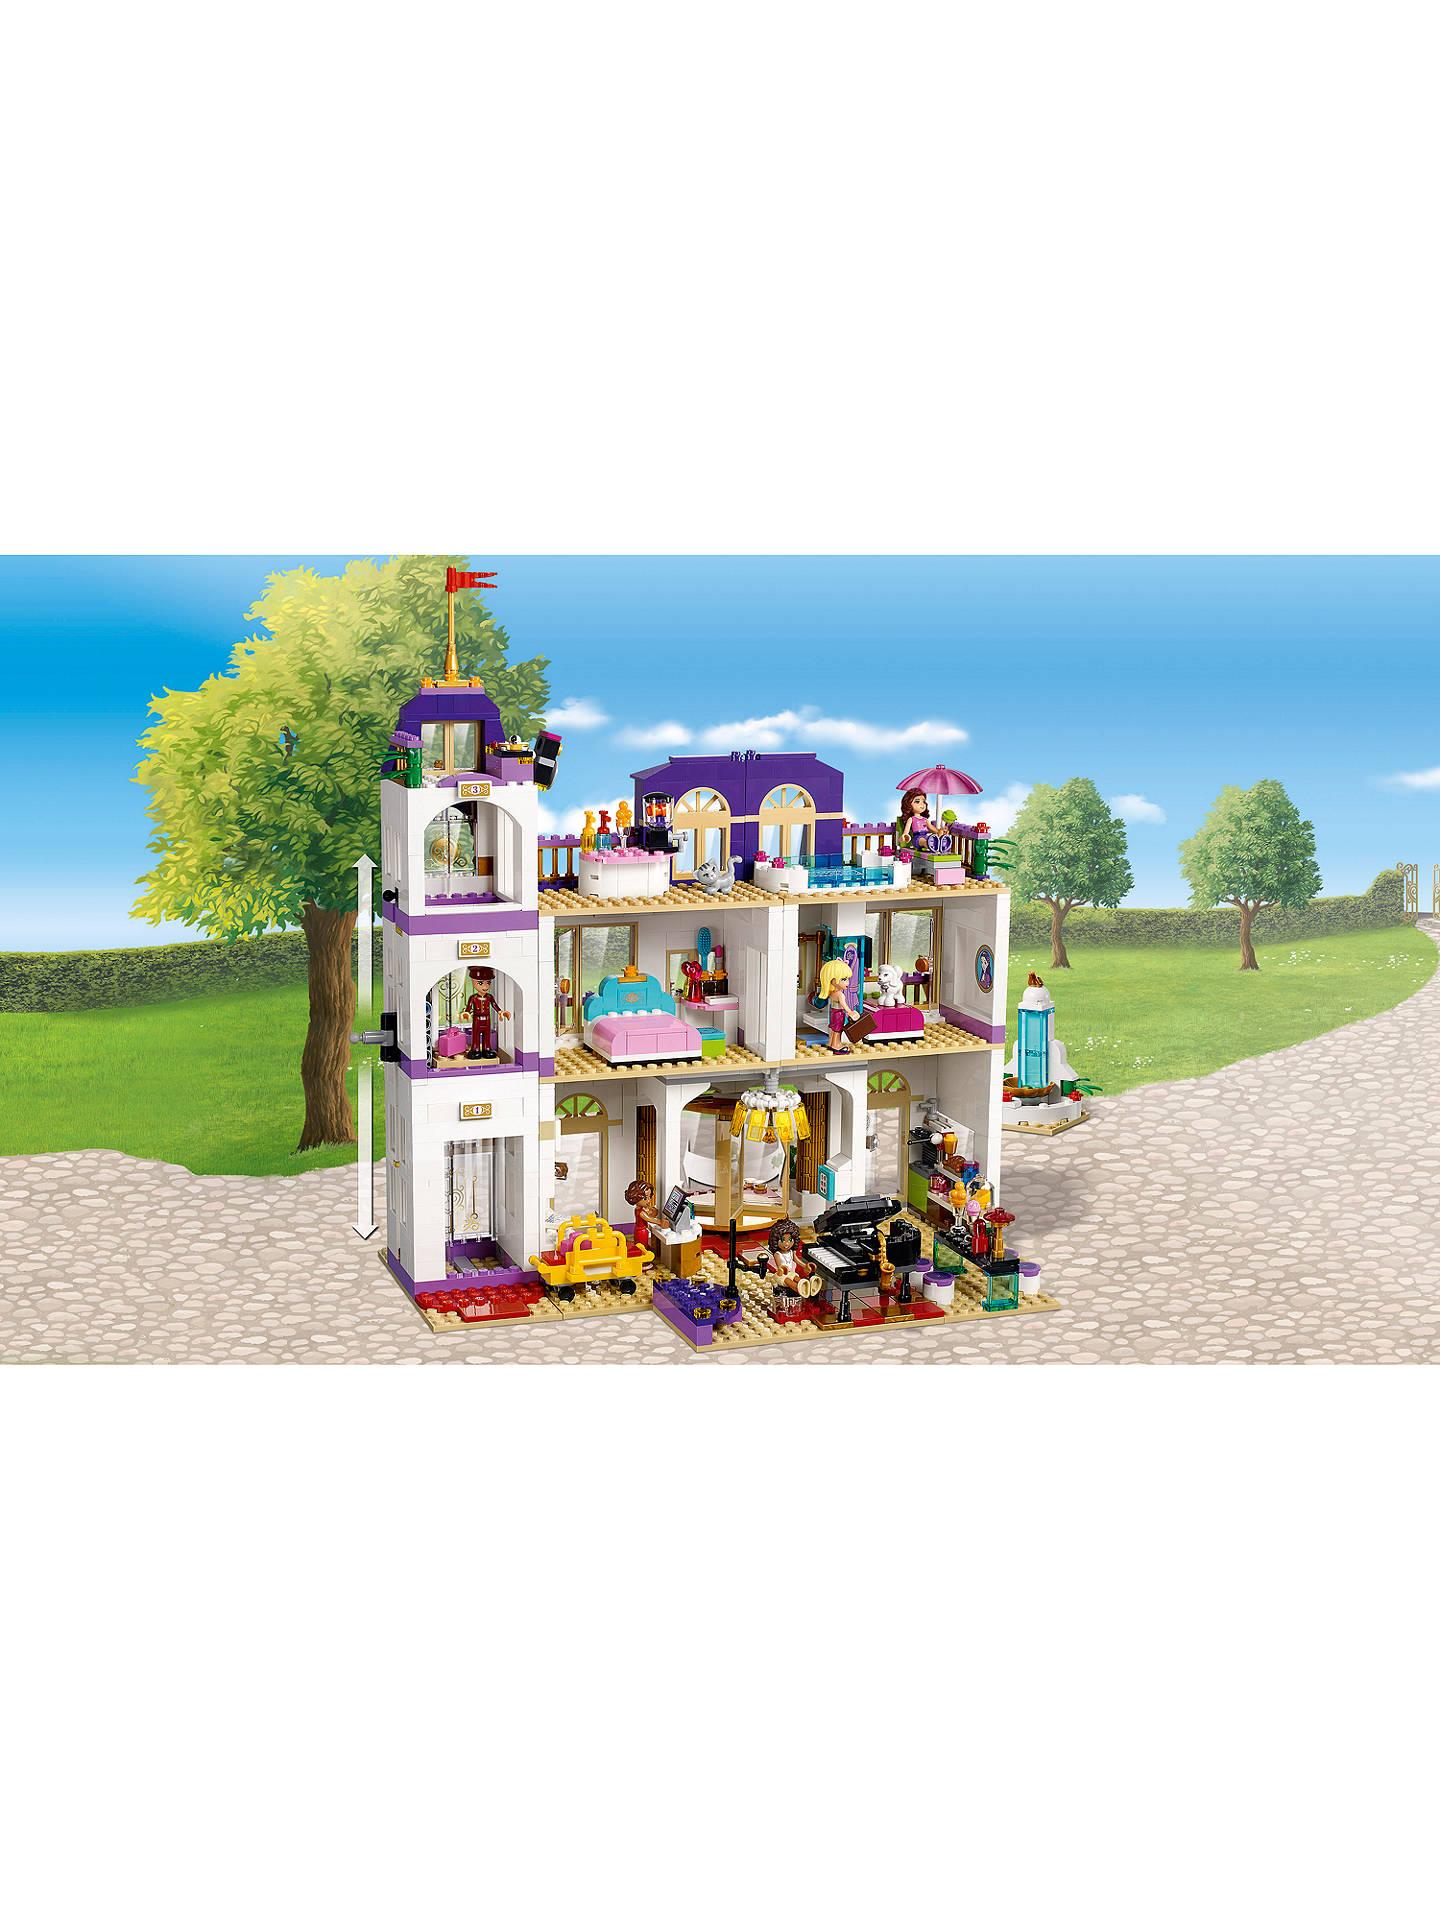 Lego Friends 41101 Heartlake Grand Hotel At John Lewis Partners